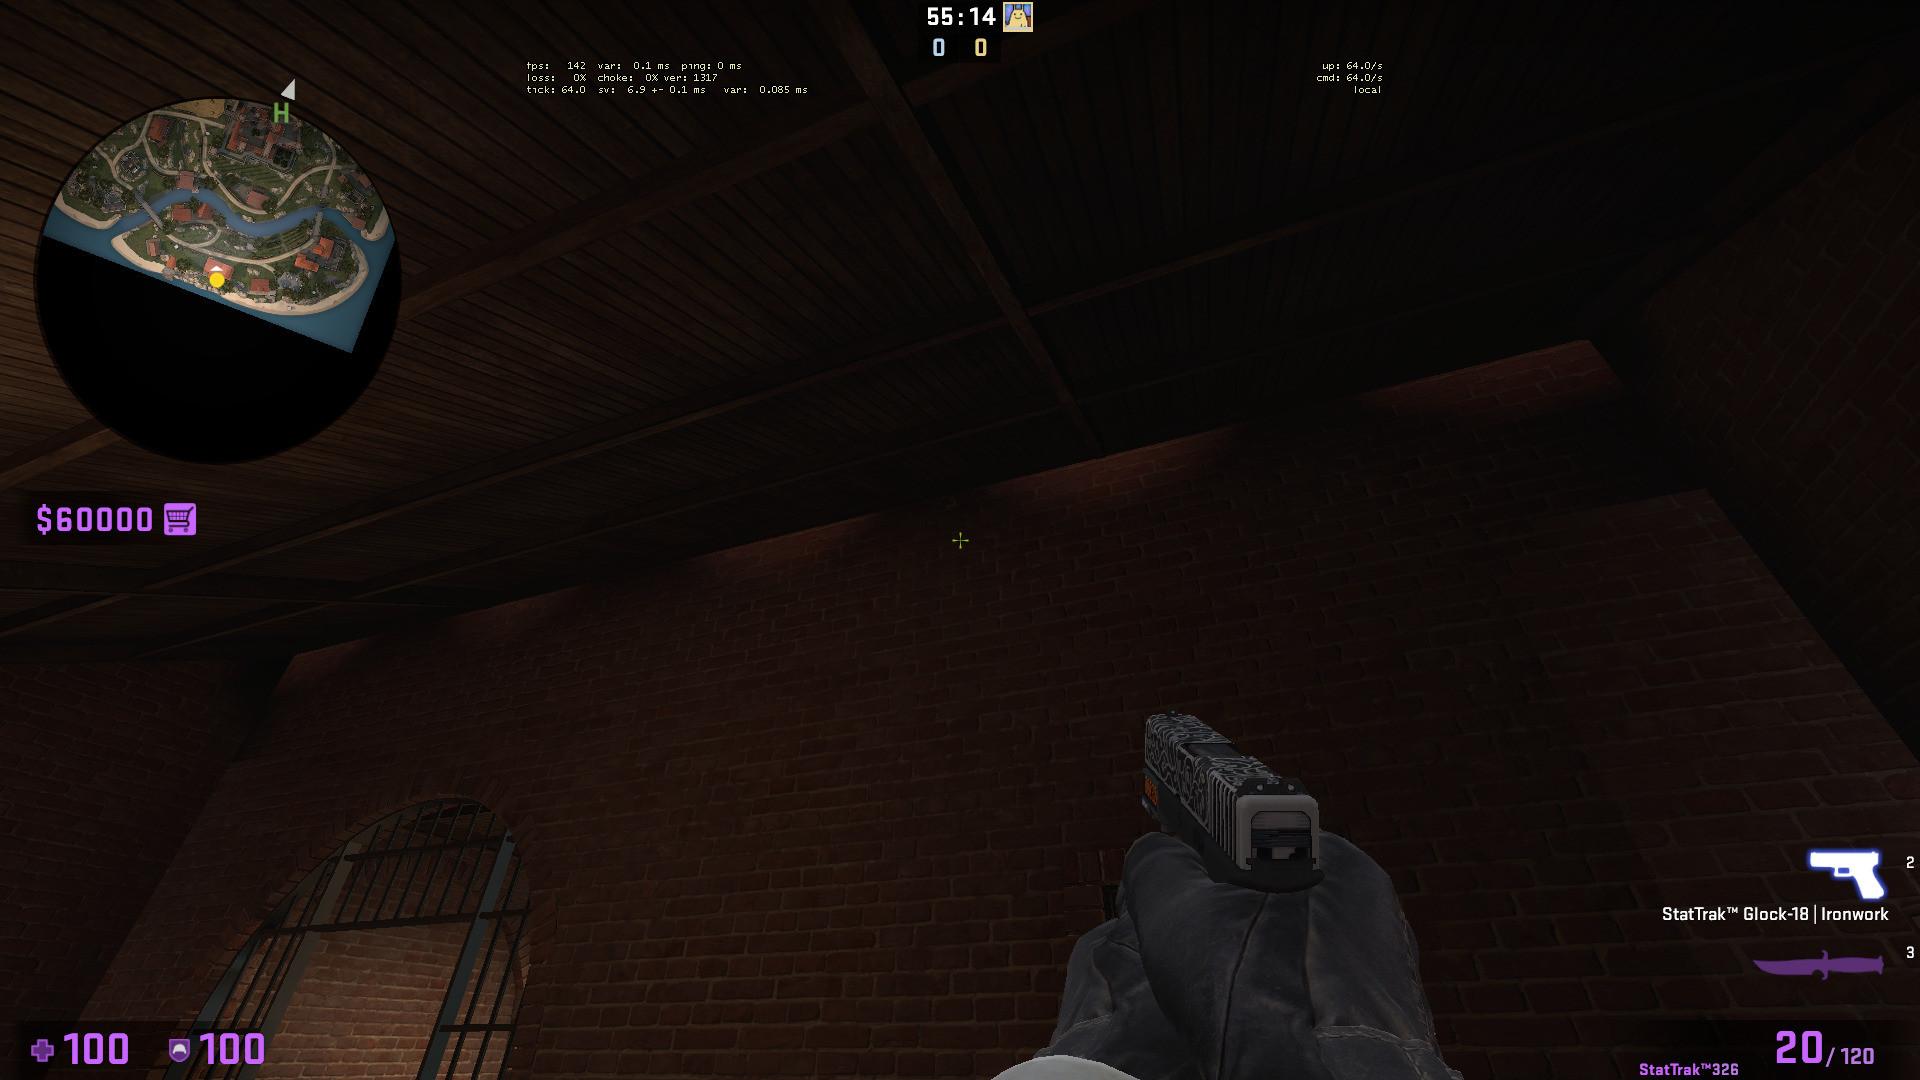 Counter-strike-Global-Offensive-Screenshot-2021_09.07-13_34_28_32.jpeg.411d90cef0ab4cbb4ef715a0592c443d.jpeg